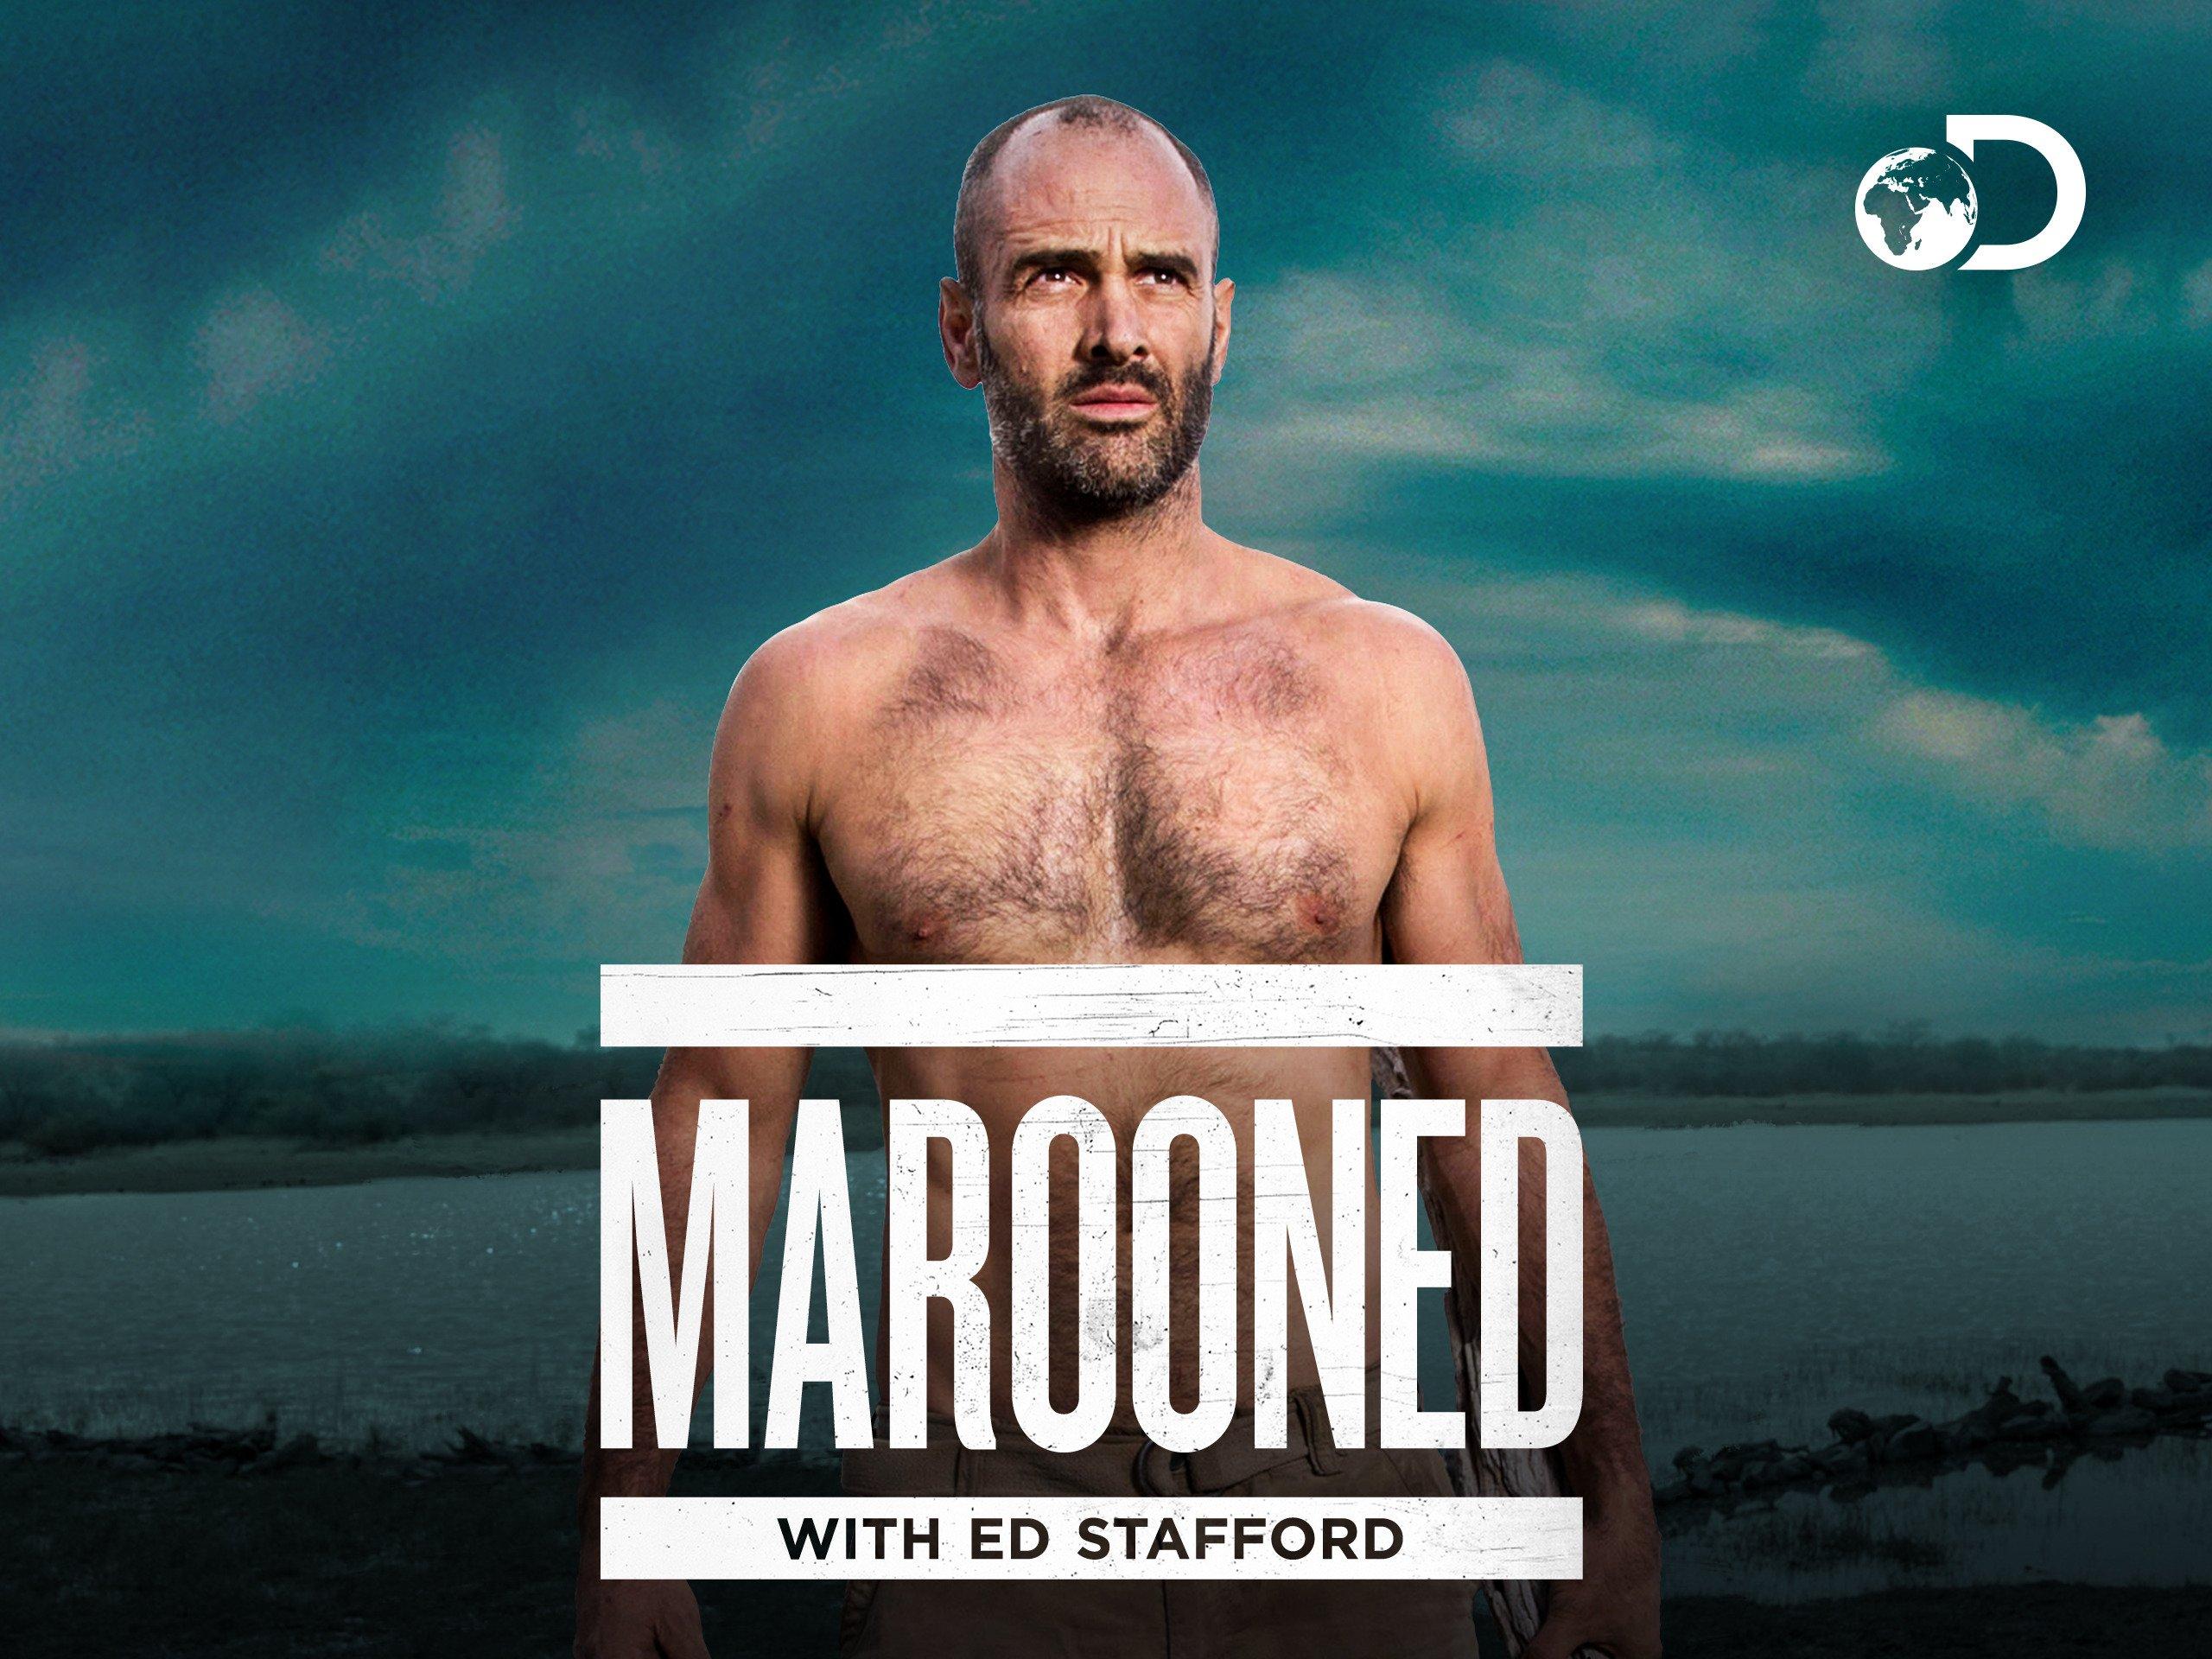 Marooned With Ed Stafford Season 1 Ep 3 Australia, Watch